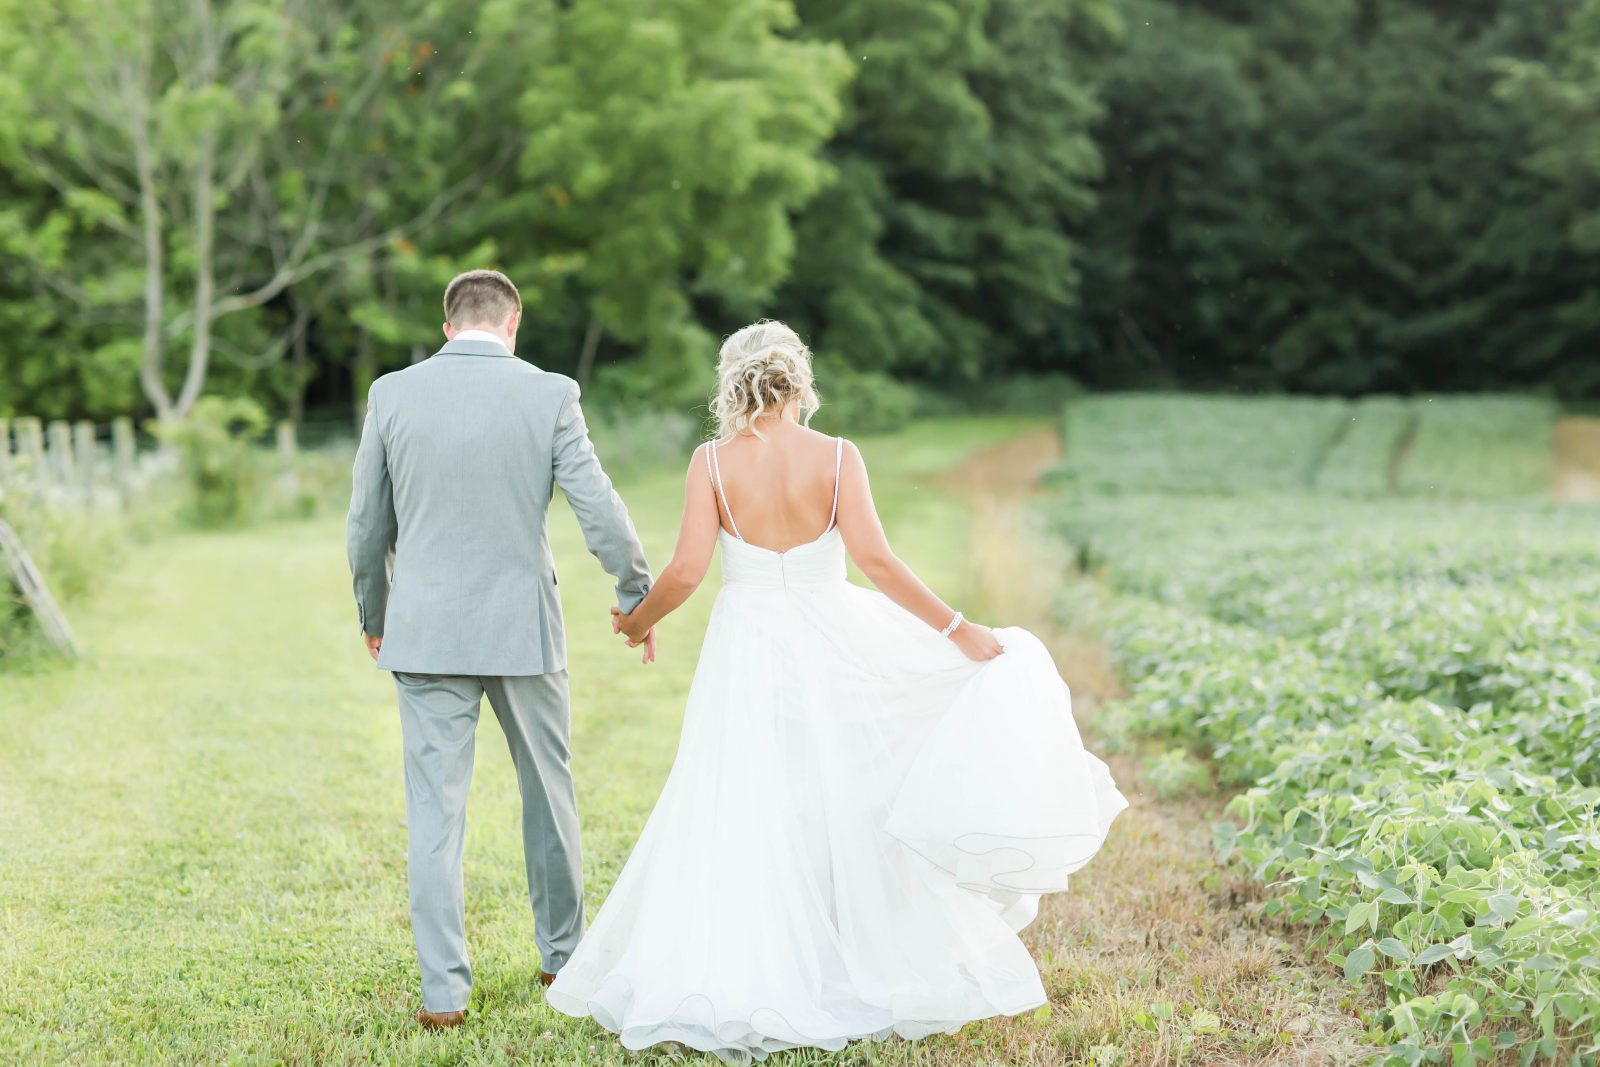 peacock-ridge-summer-wedding-photographer-akron-ohio-loren-jackson-photography-123